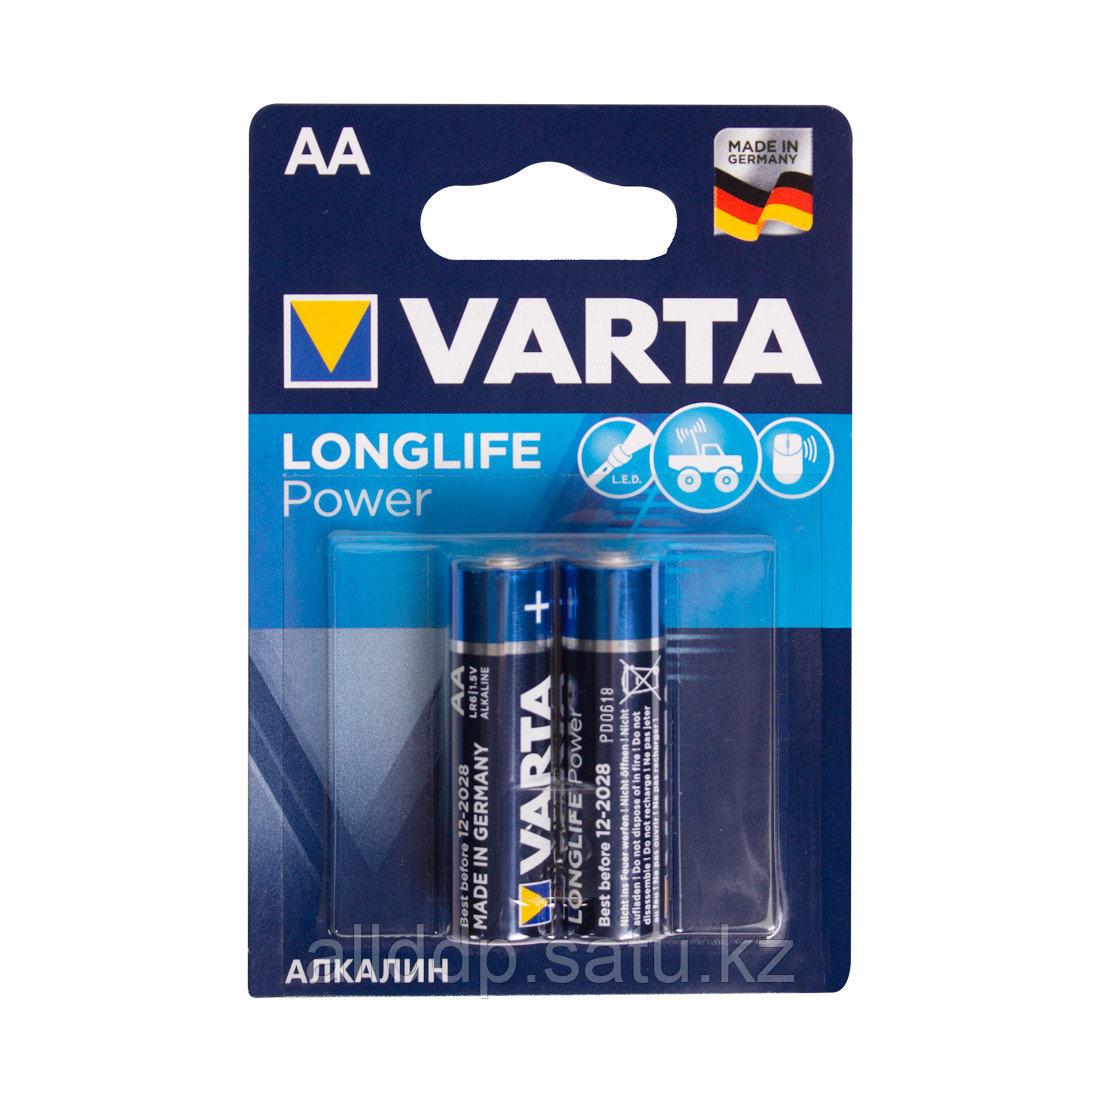 Батарейка VARTA Long Life Power Mignon 1.5V - LR6/ AA (2 шт) (4906)